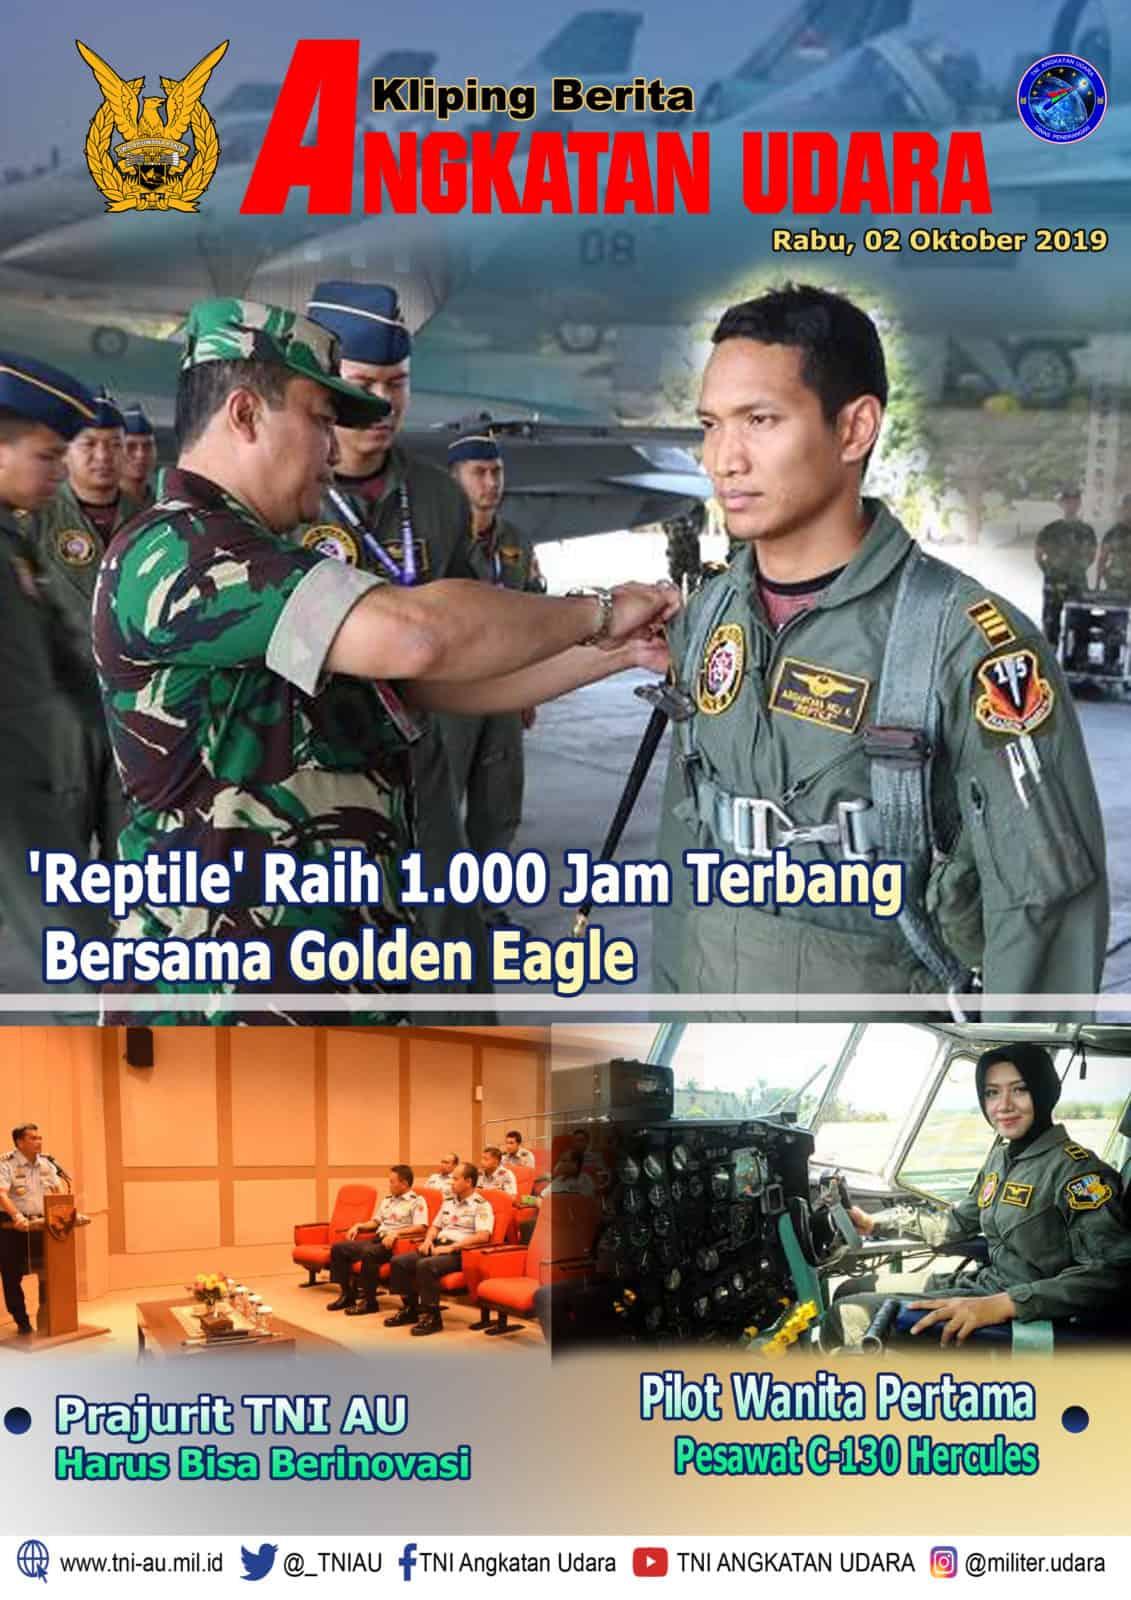 Kliping Berita Media 02 Oktober 2019